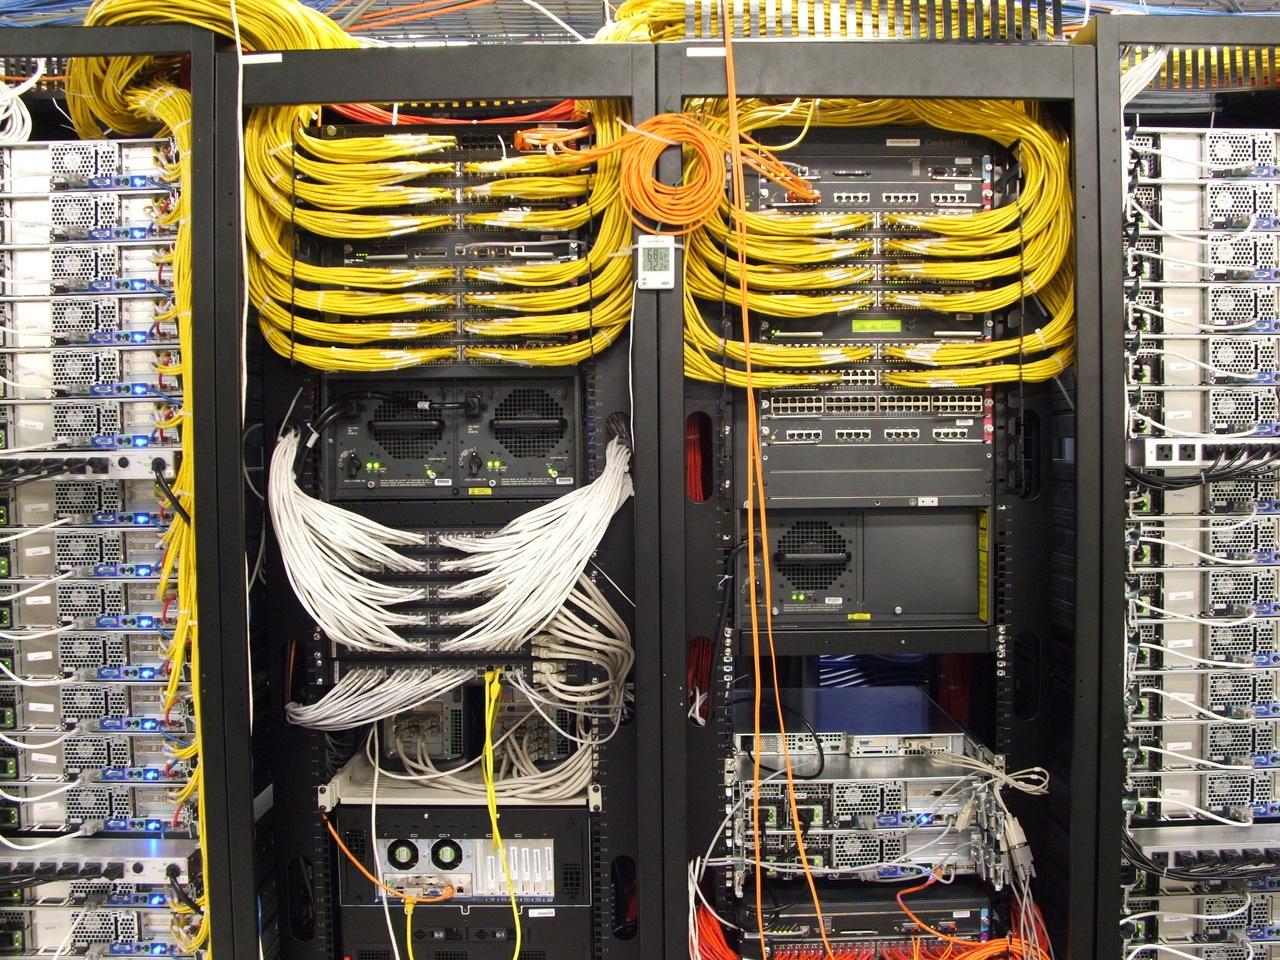 Network Services Scsi Gibraltar